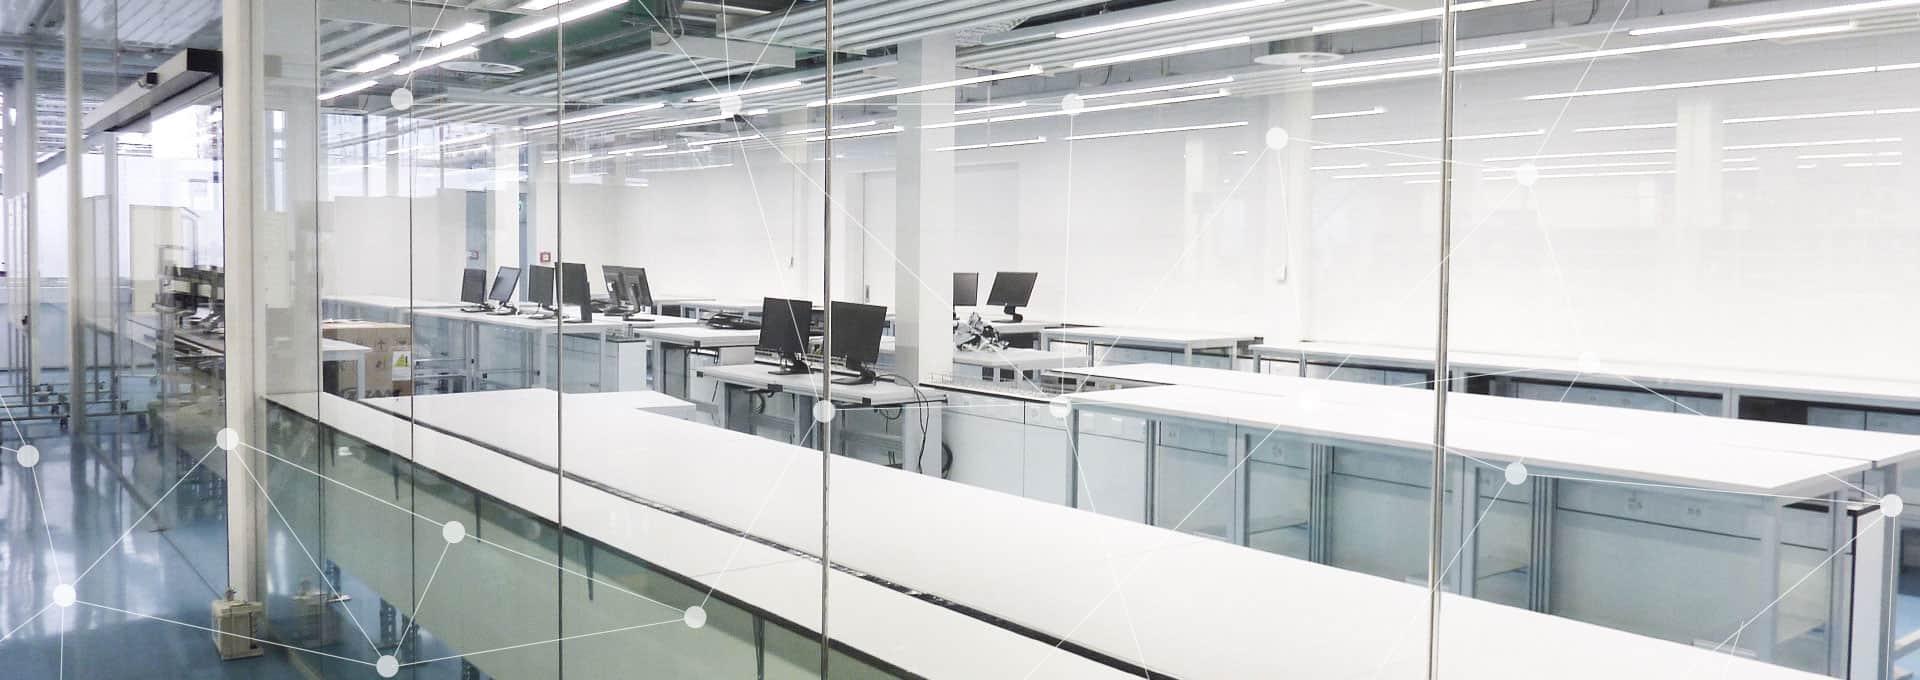 elektroplanung projektmanagement fachbauleitung pruflabor roche diagnostics rotkreuz elmaplan ag